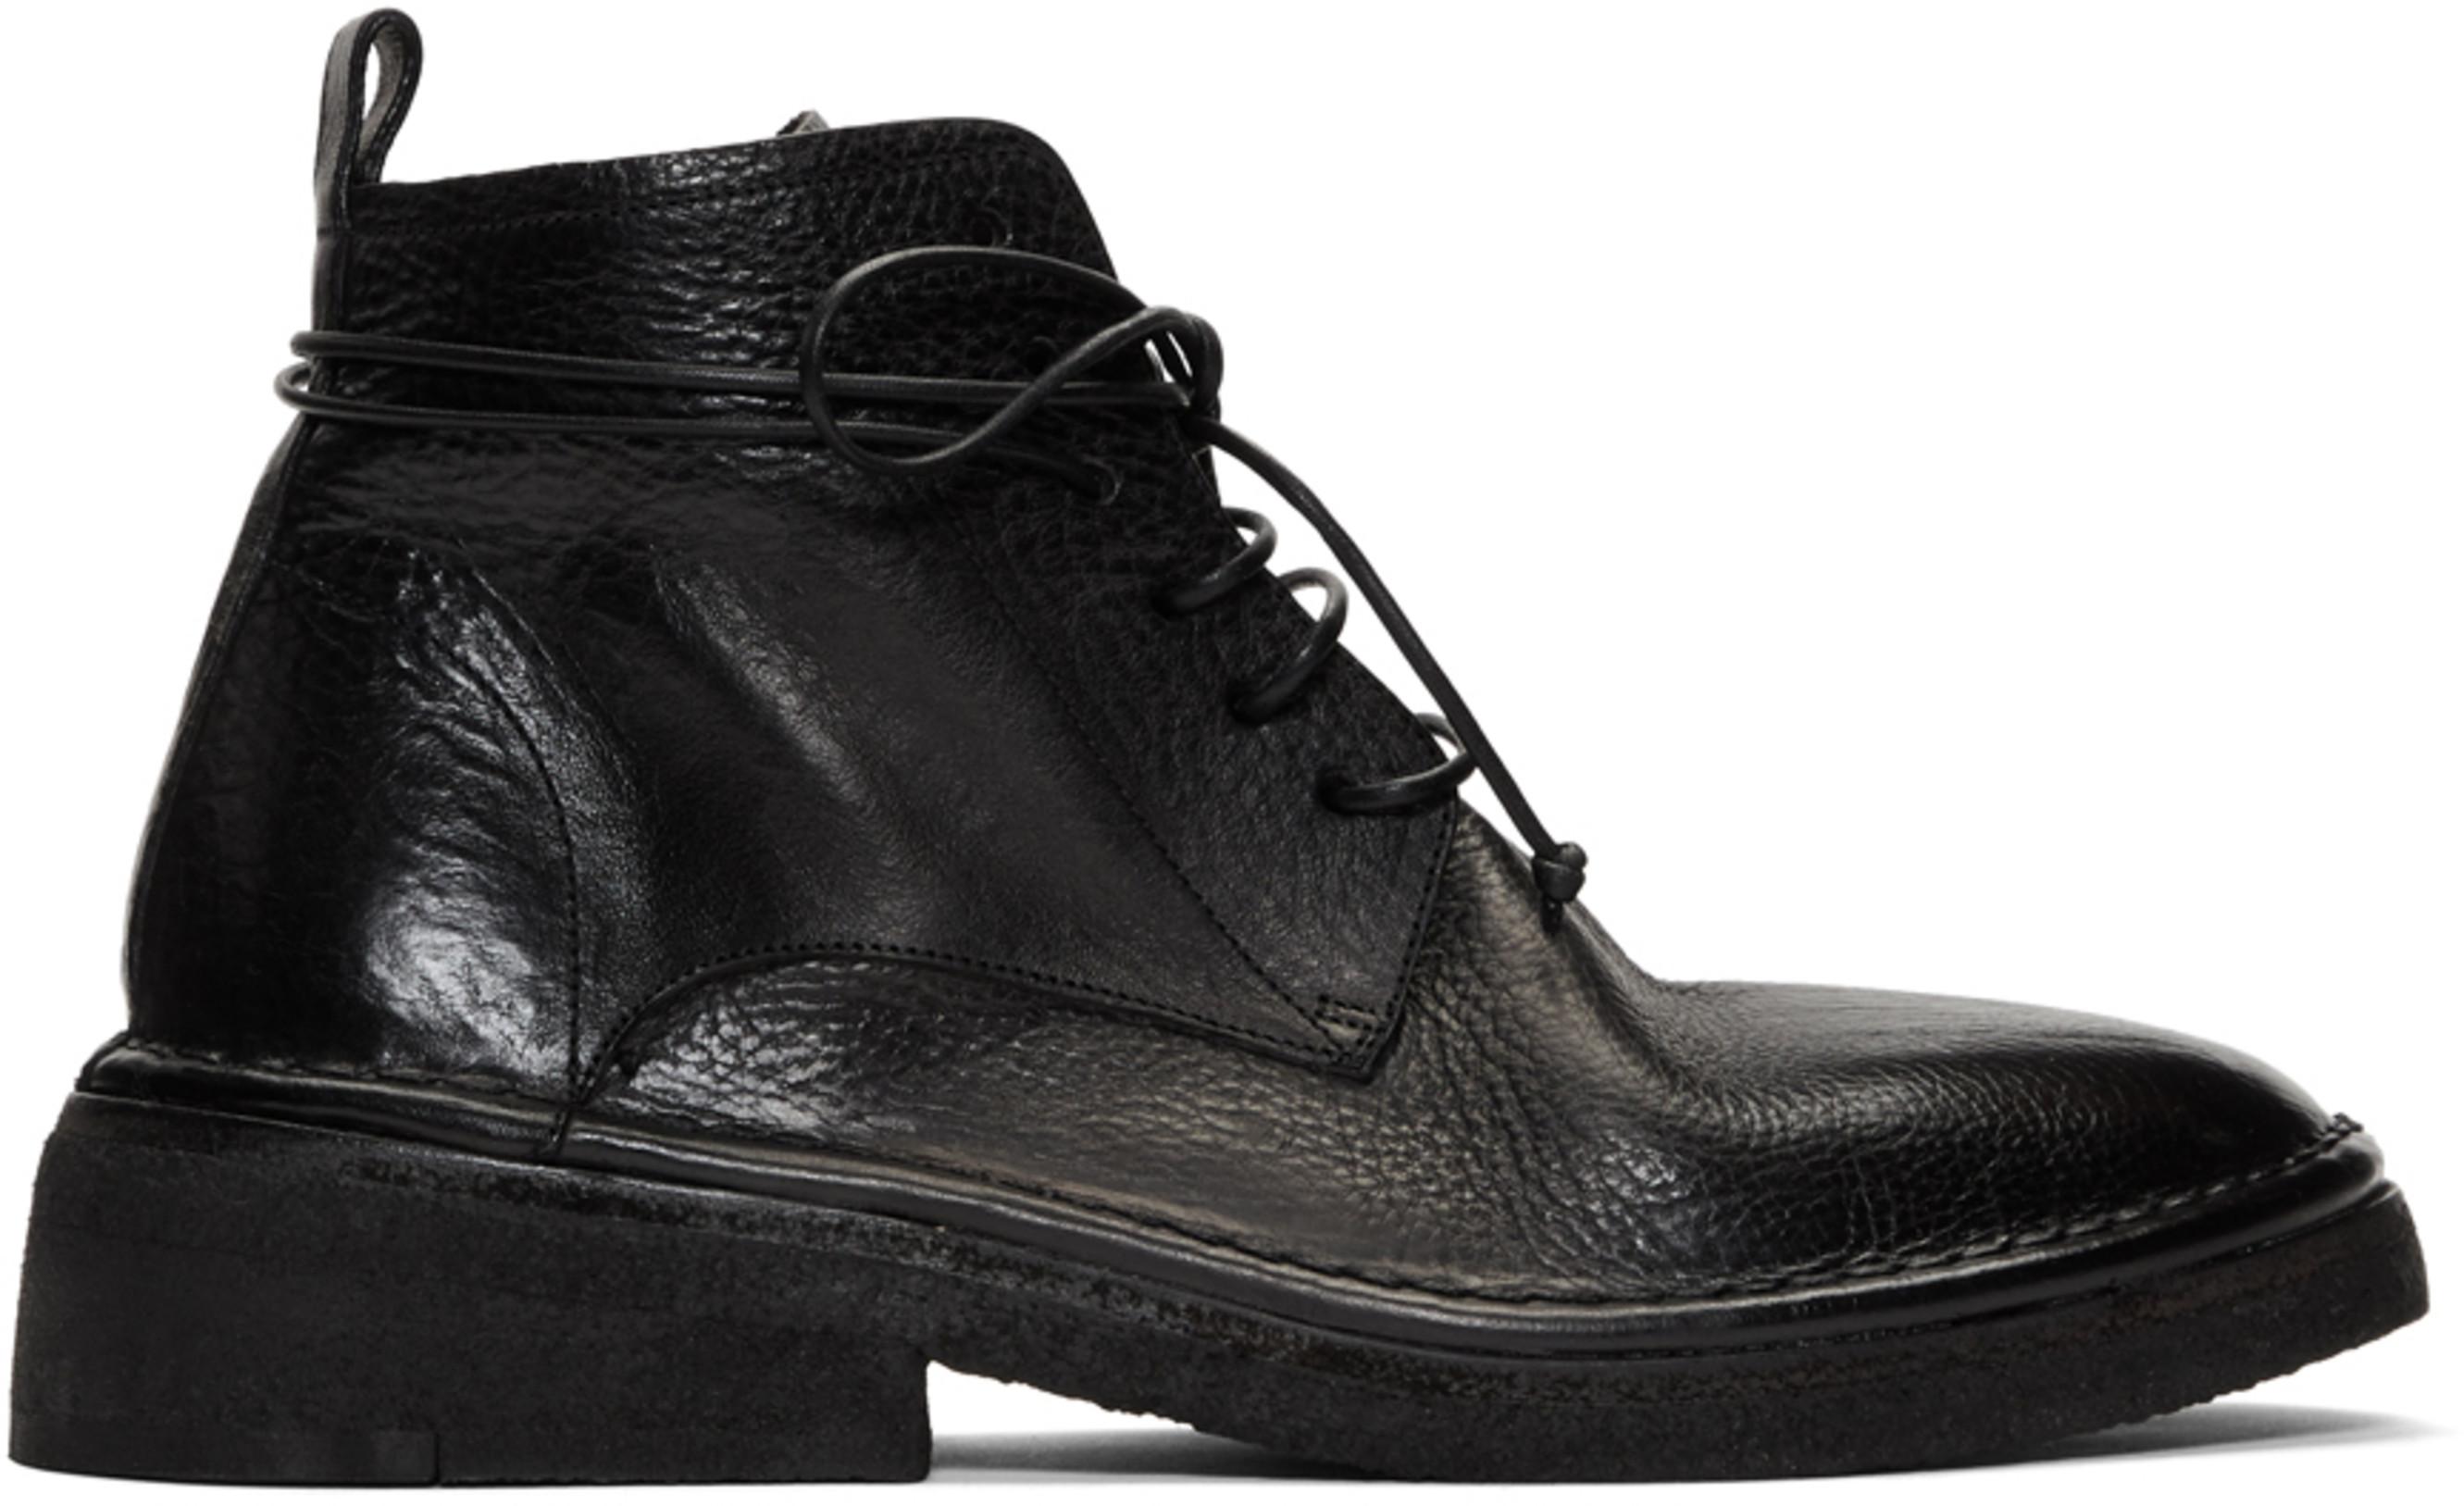 a054938b8ee Black Burraccia Anfibio Boots